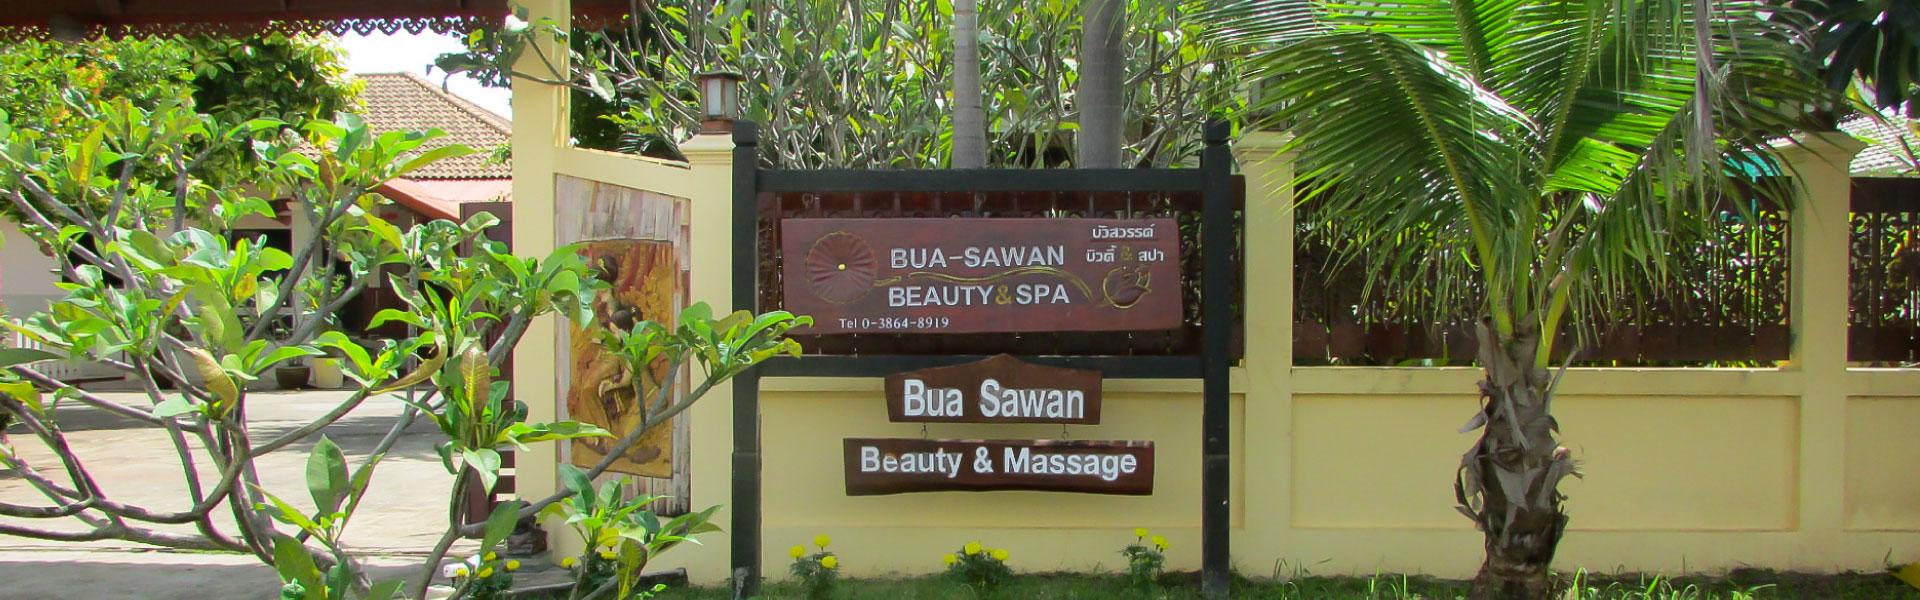 Busuawan-entry